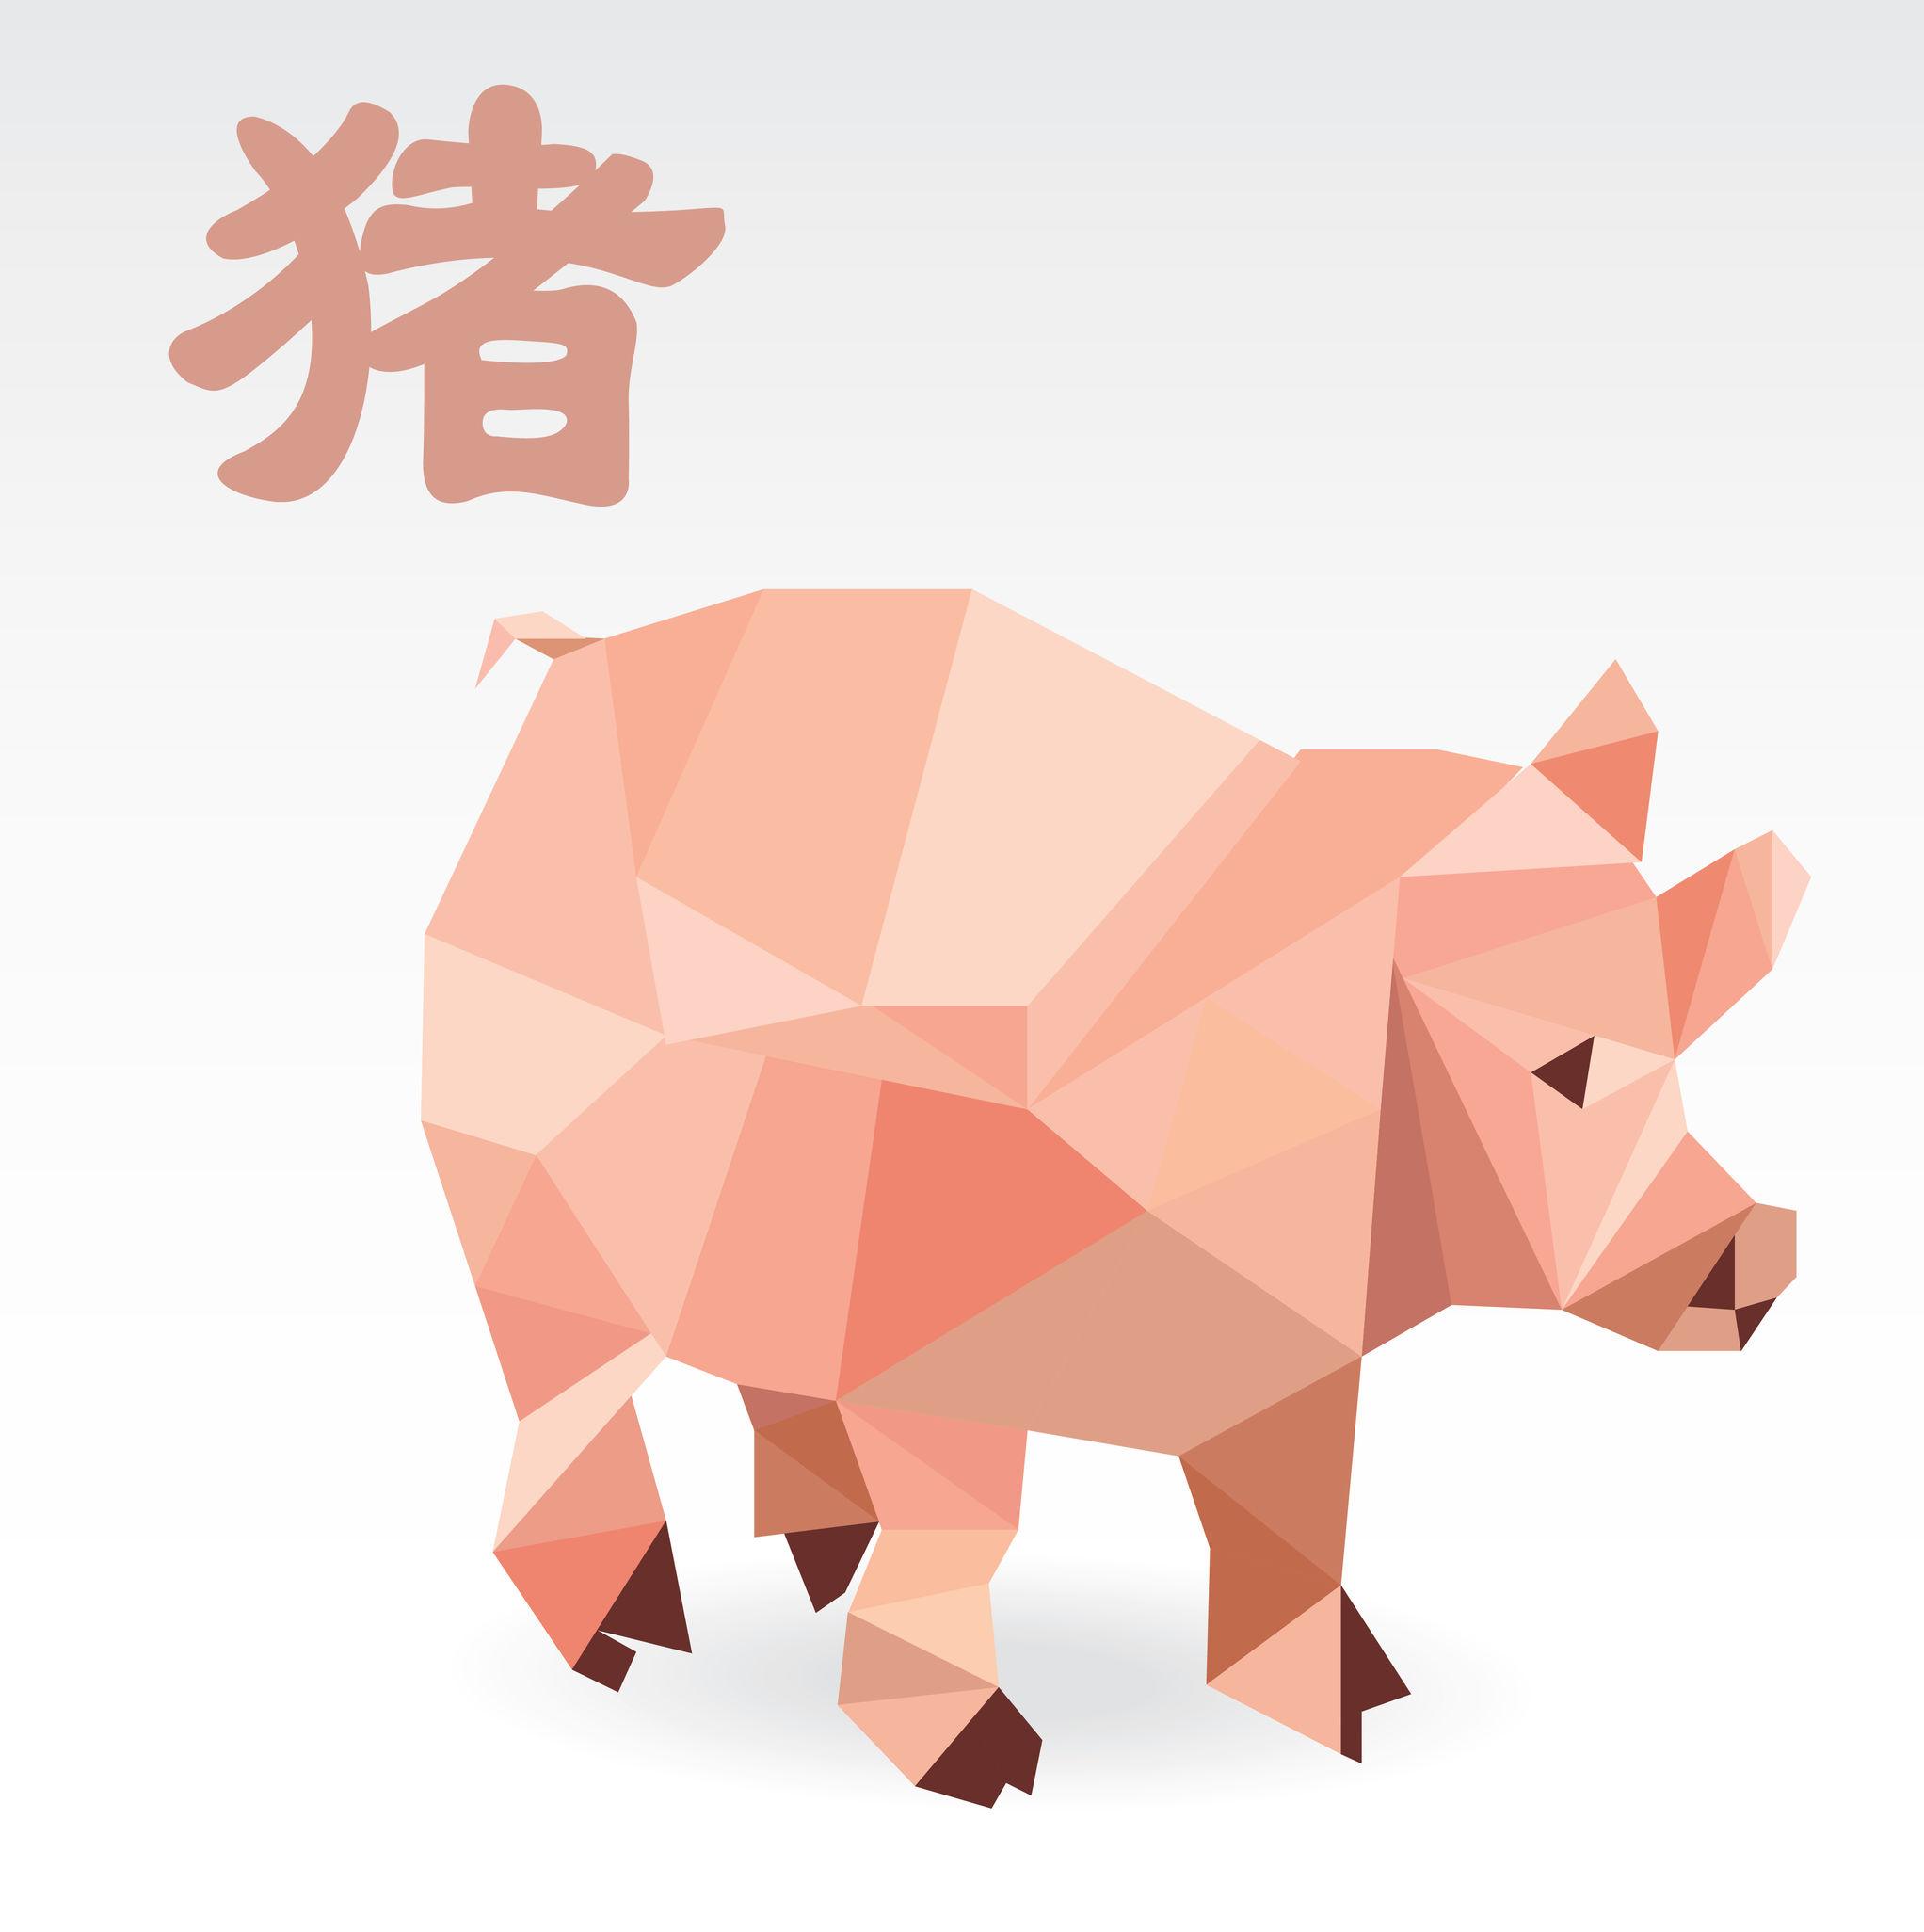 chinese horoscope 2020 prediction pig